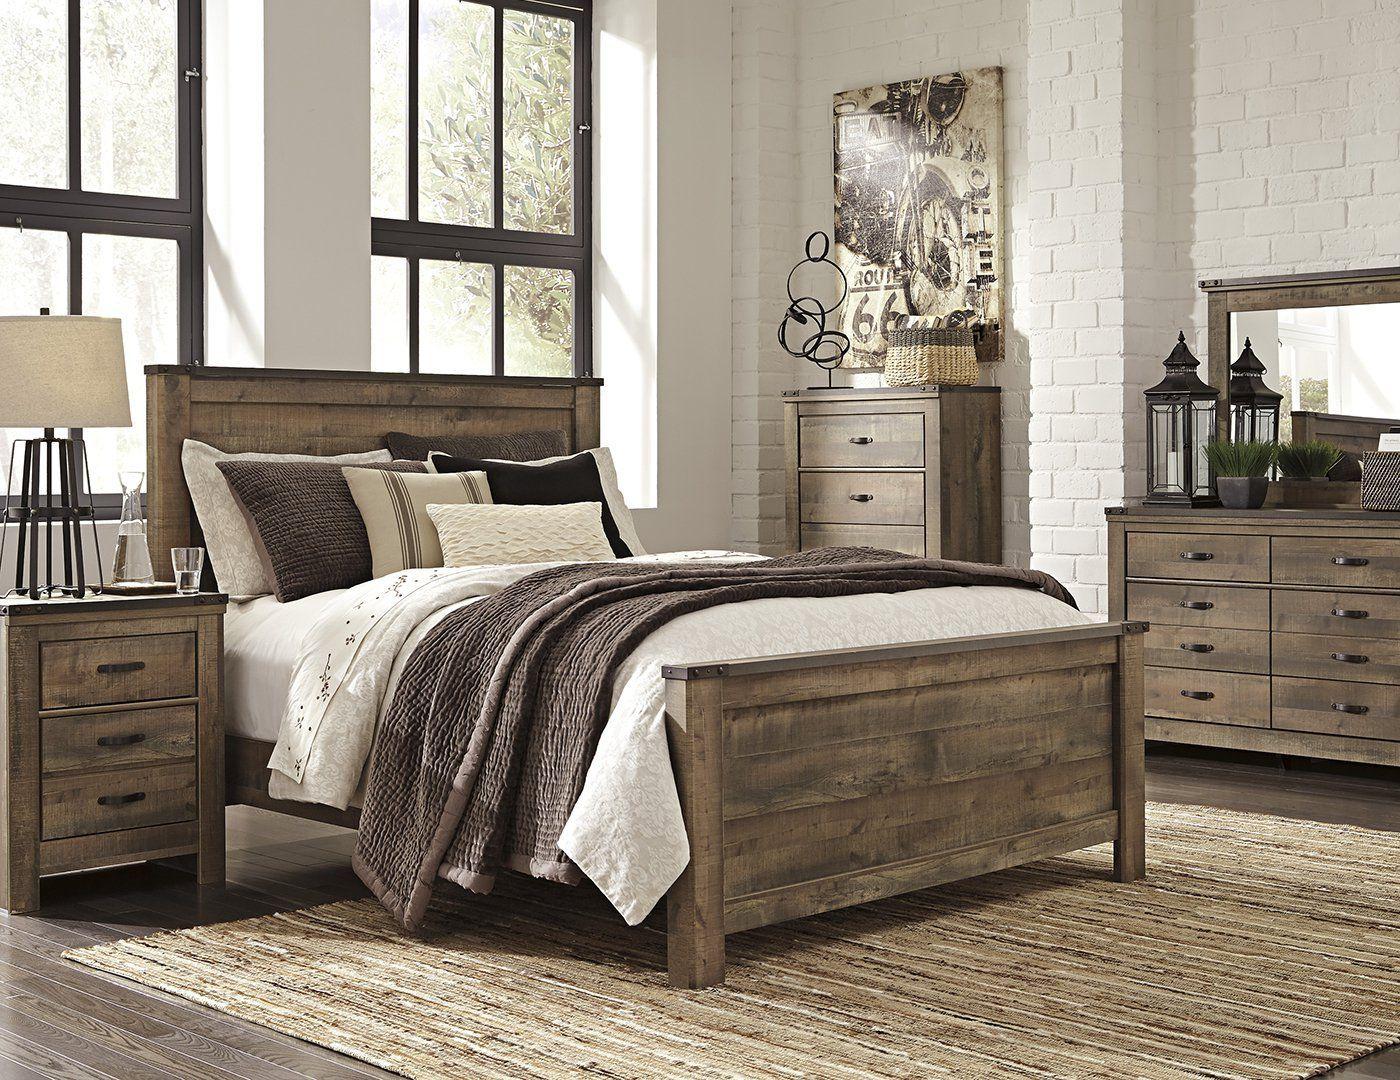 Trinell 5 Pc King Bedroom Set Kingbedroomsets House Pinterest